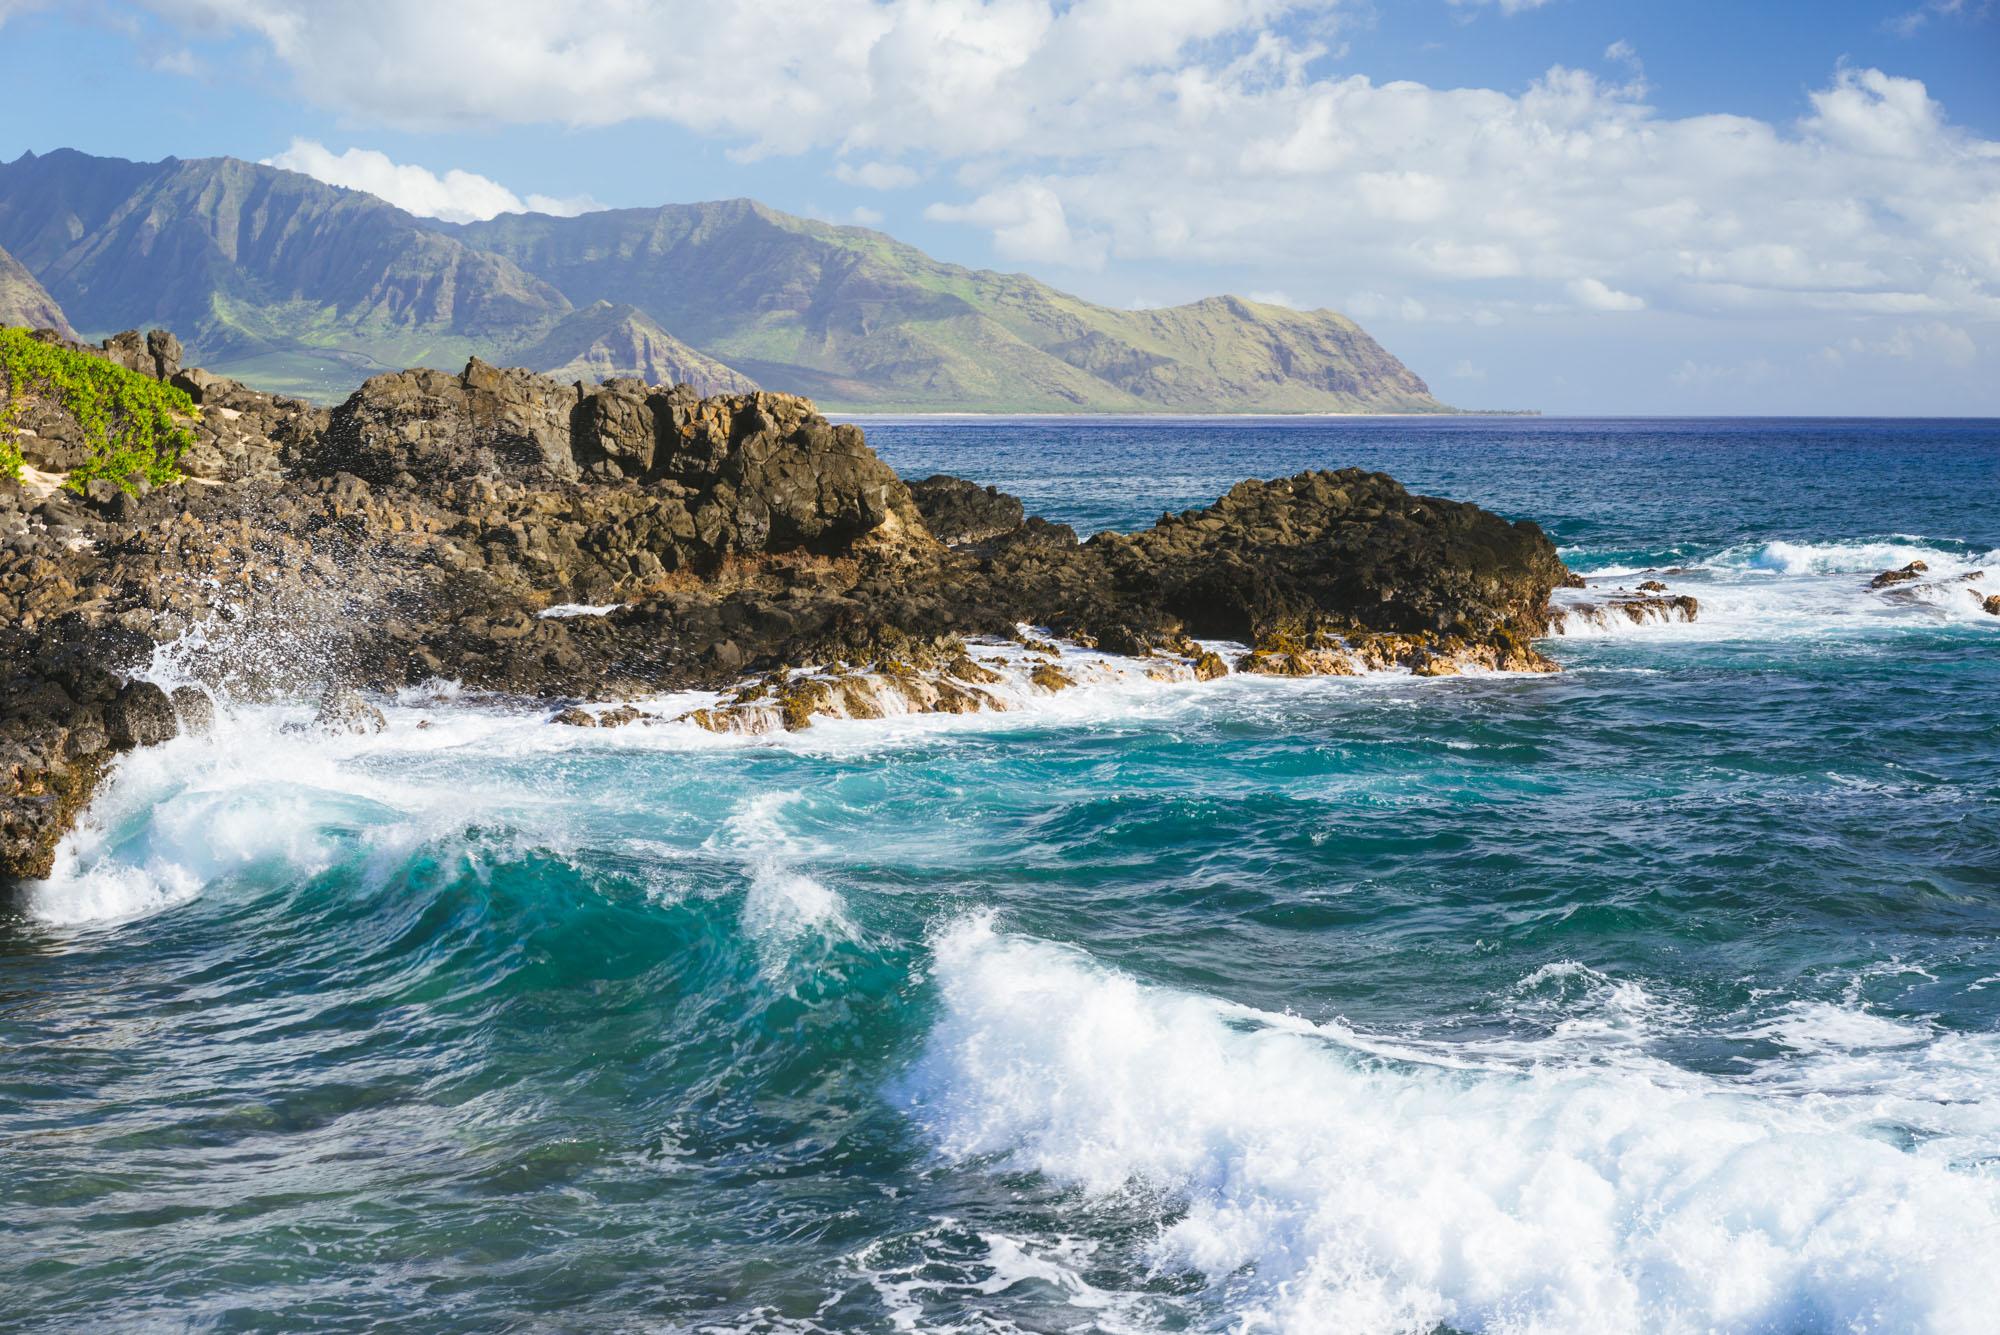 And on to Hawaii, Kaena Point